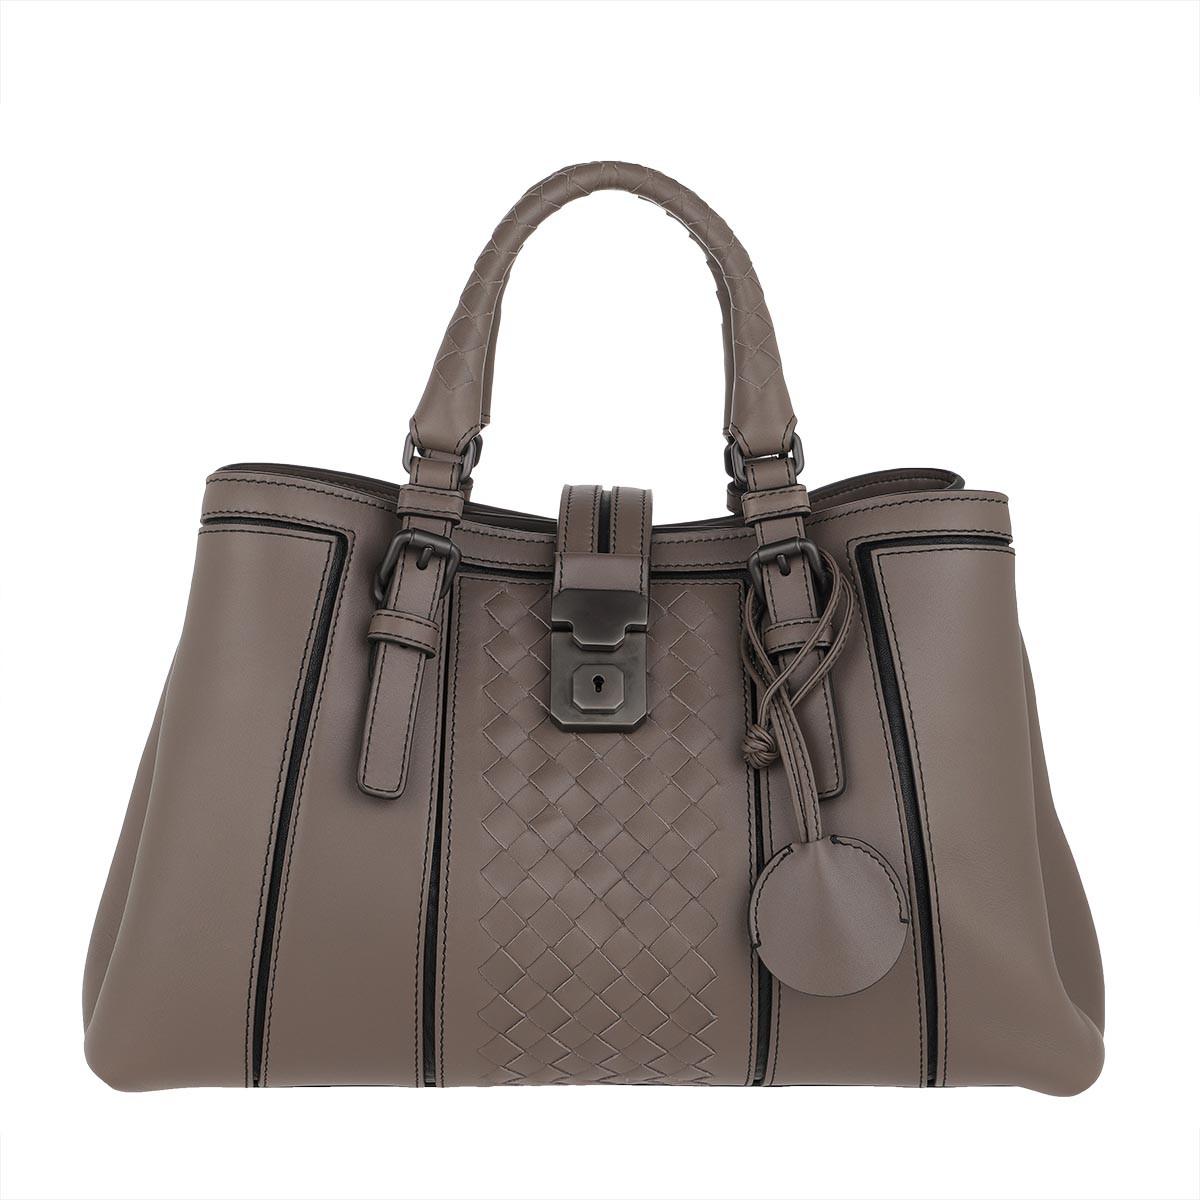 Bottega Veneta Tote - Roma Bag Small Calf Leather Steel - in grau - für Damen